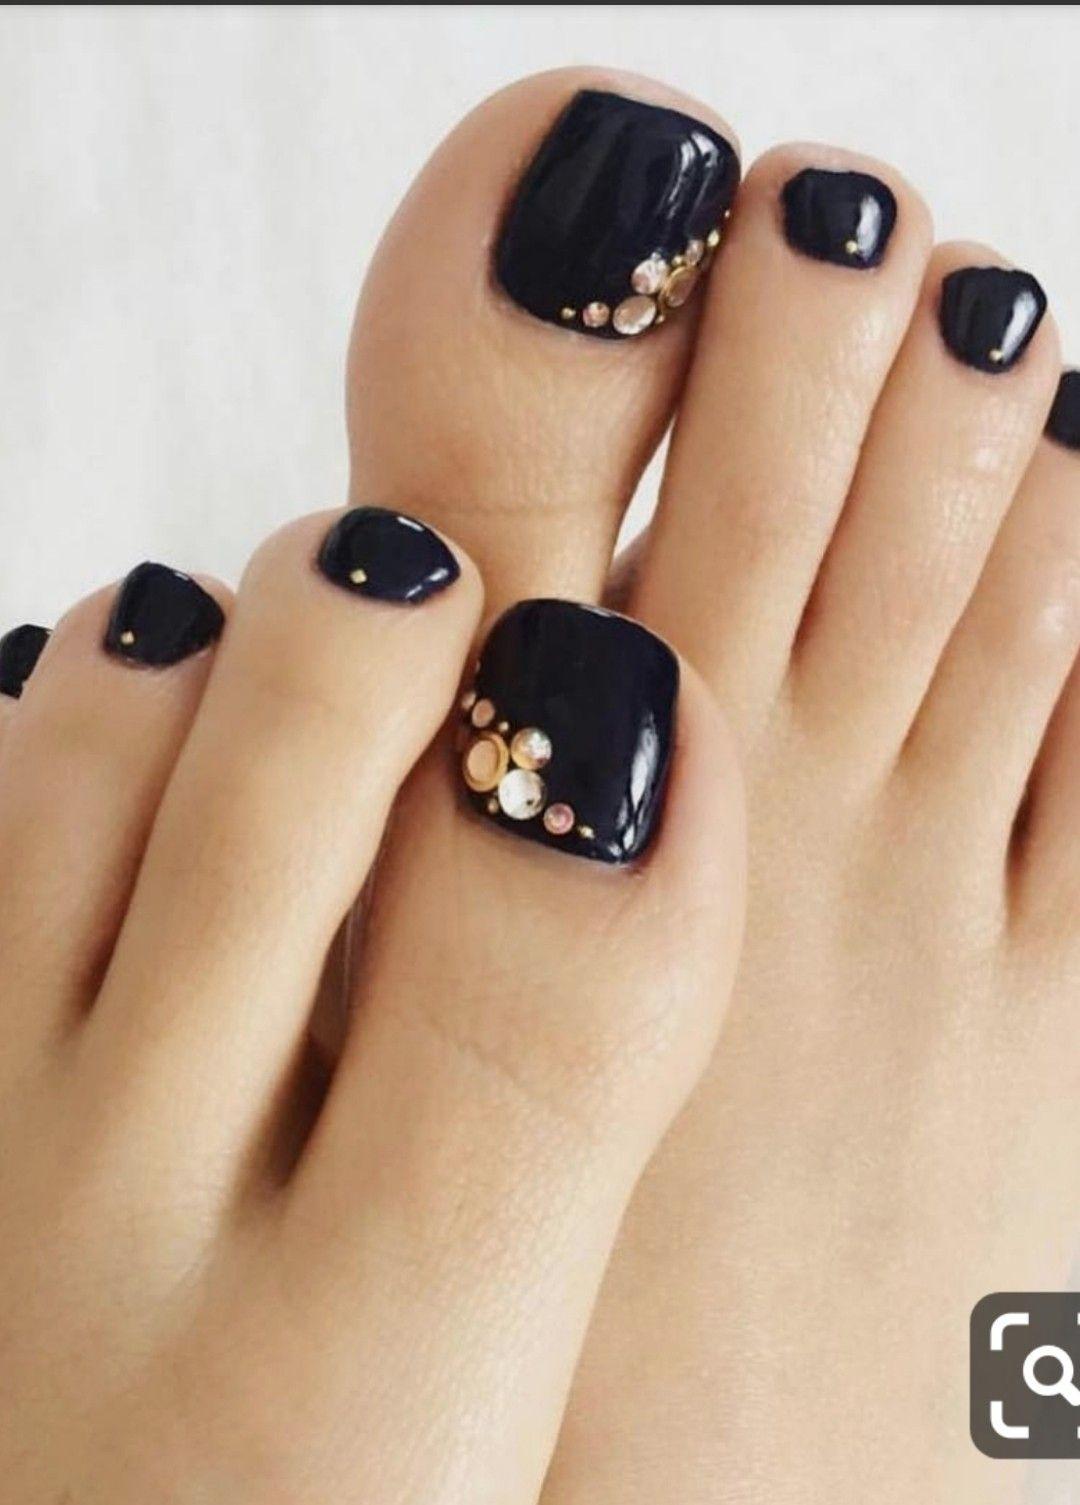 Pin By Eve O Hannigan On Nail Art Black Toe Nails Toe Nails Toe Nail Art